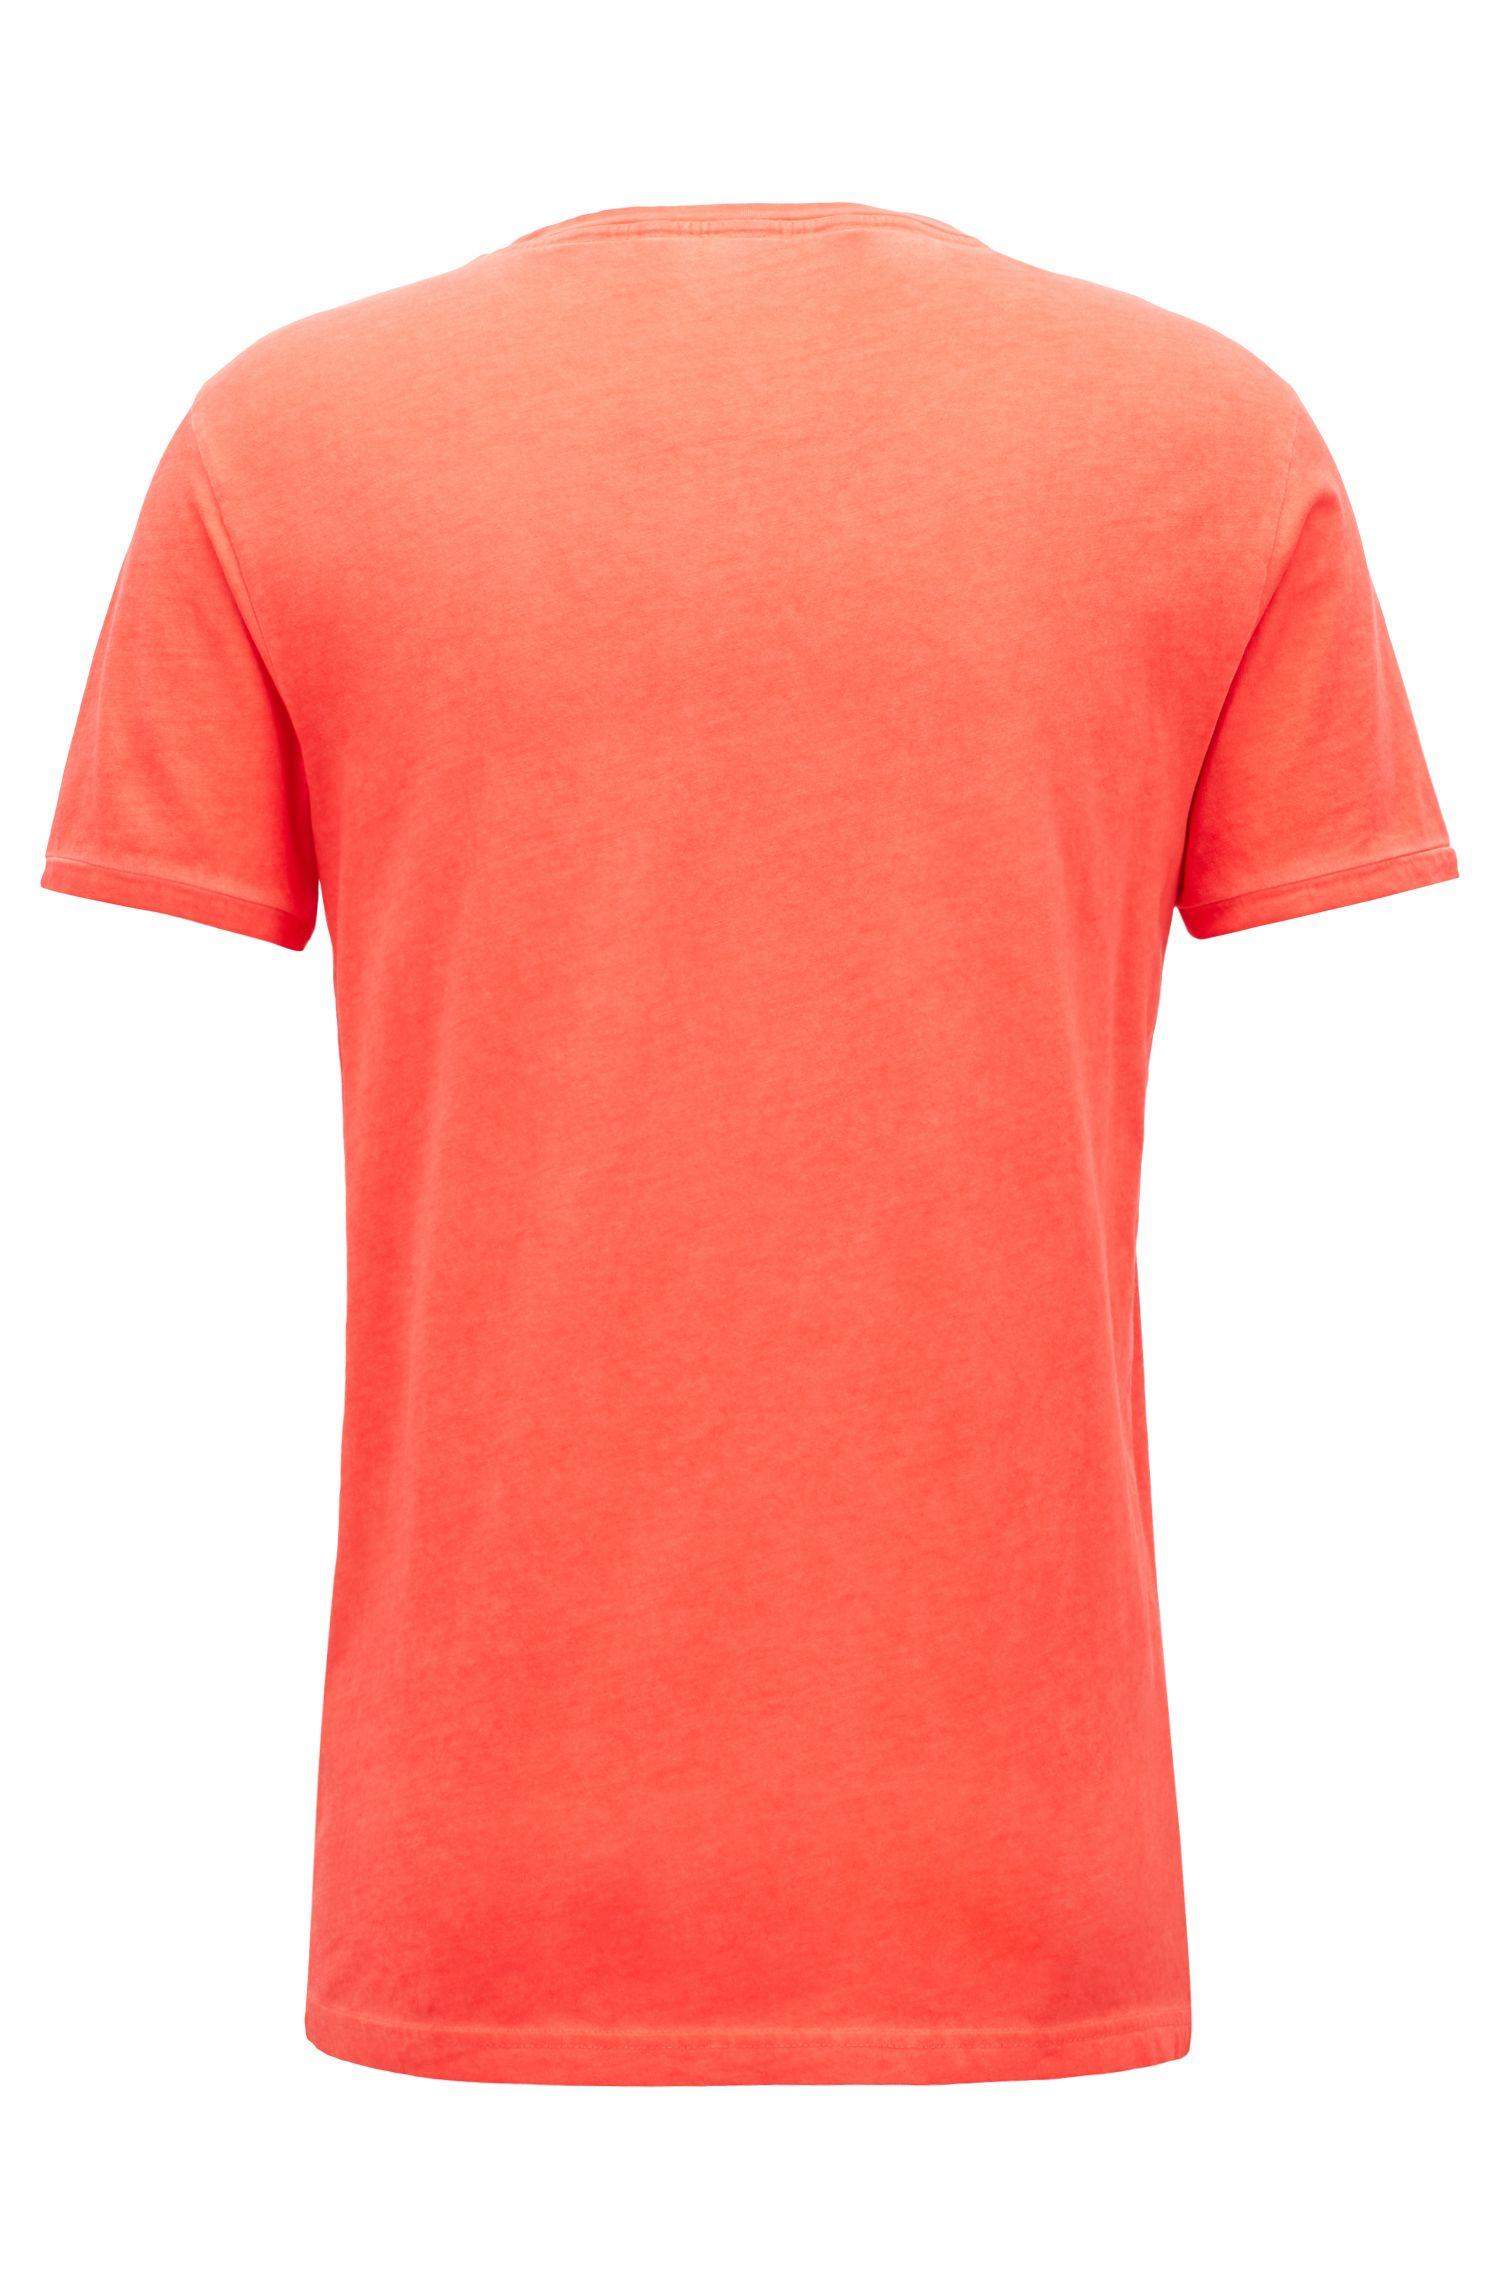 Stückgefärbtes Regular-Fit T-Shirt aus Baumwolle, Hellrot